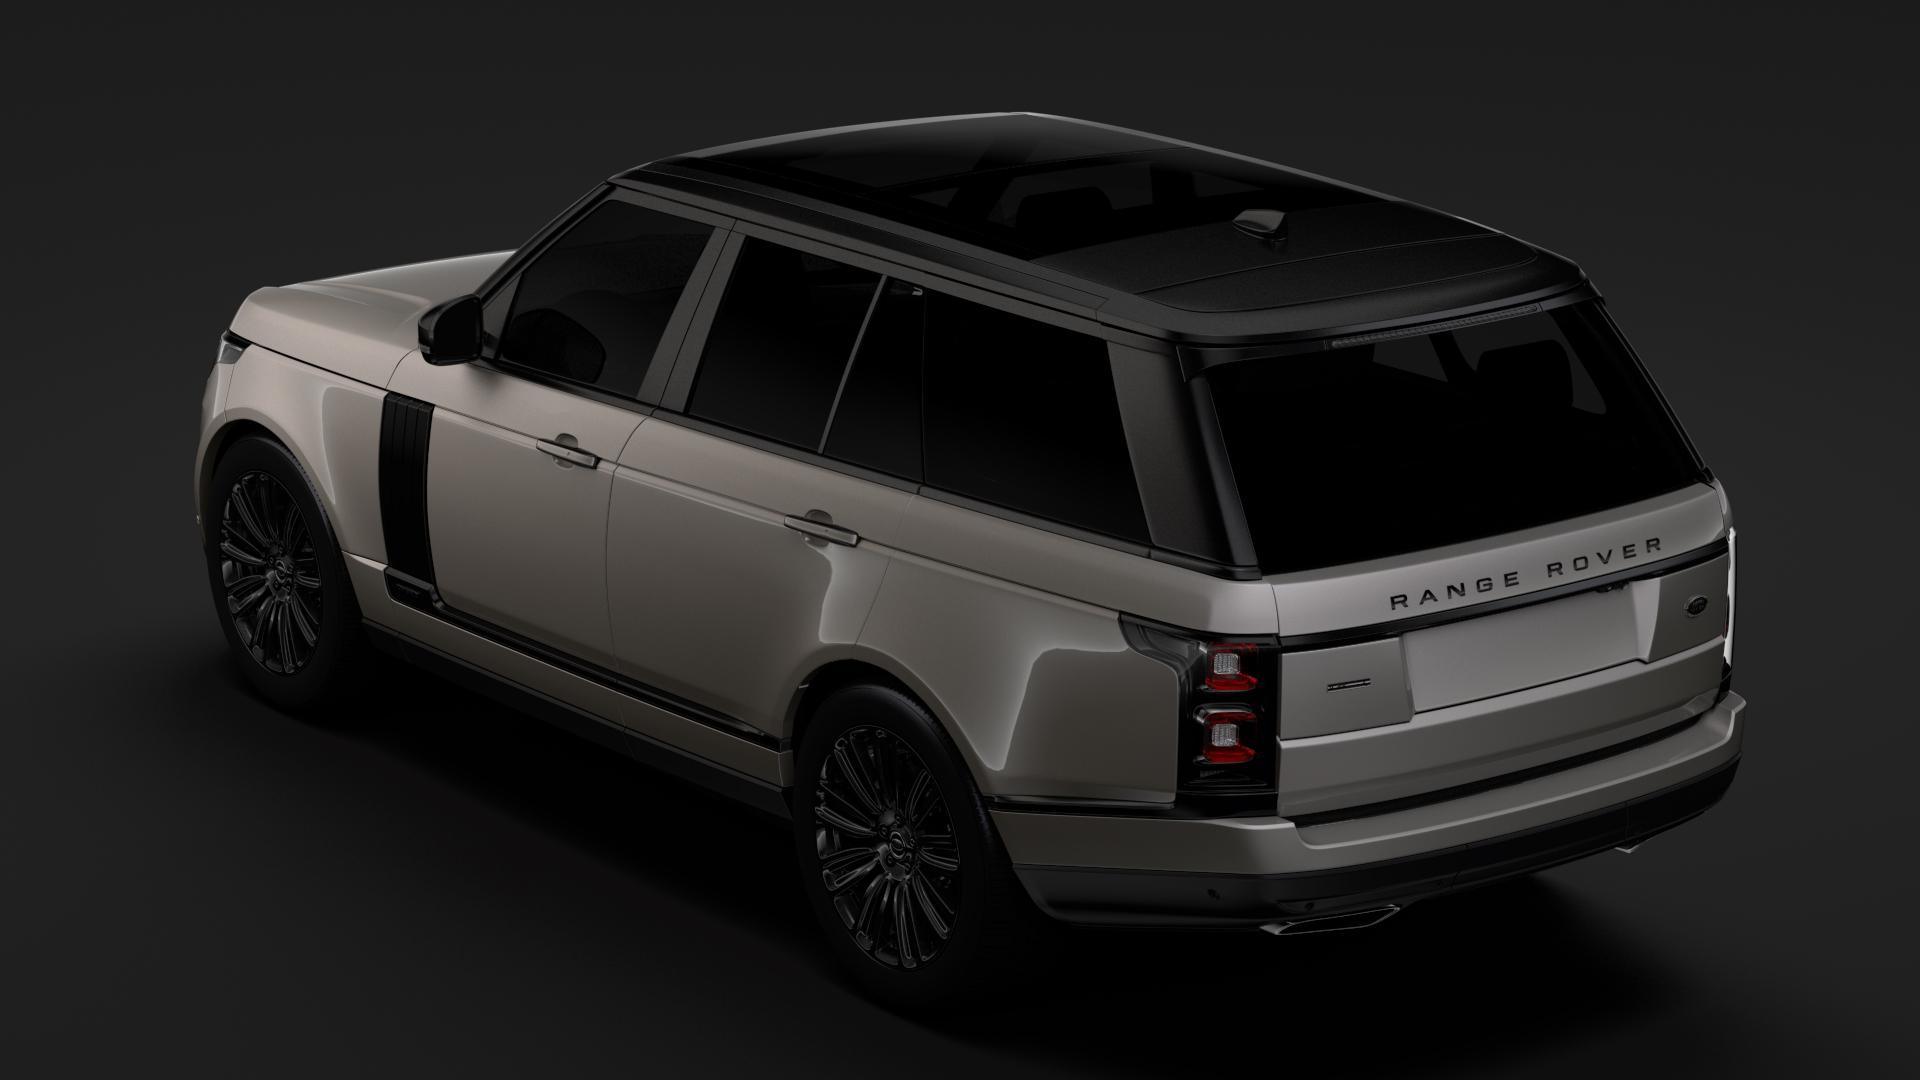 range rover autobiography hybrid (l405) 2018 3d model max fbx c4d lwo ma mb hrc xsi obj 278148